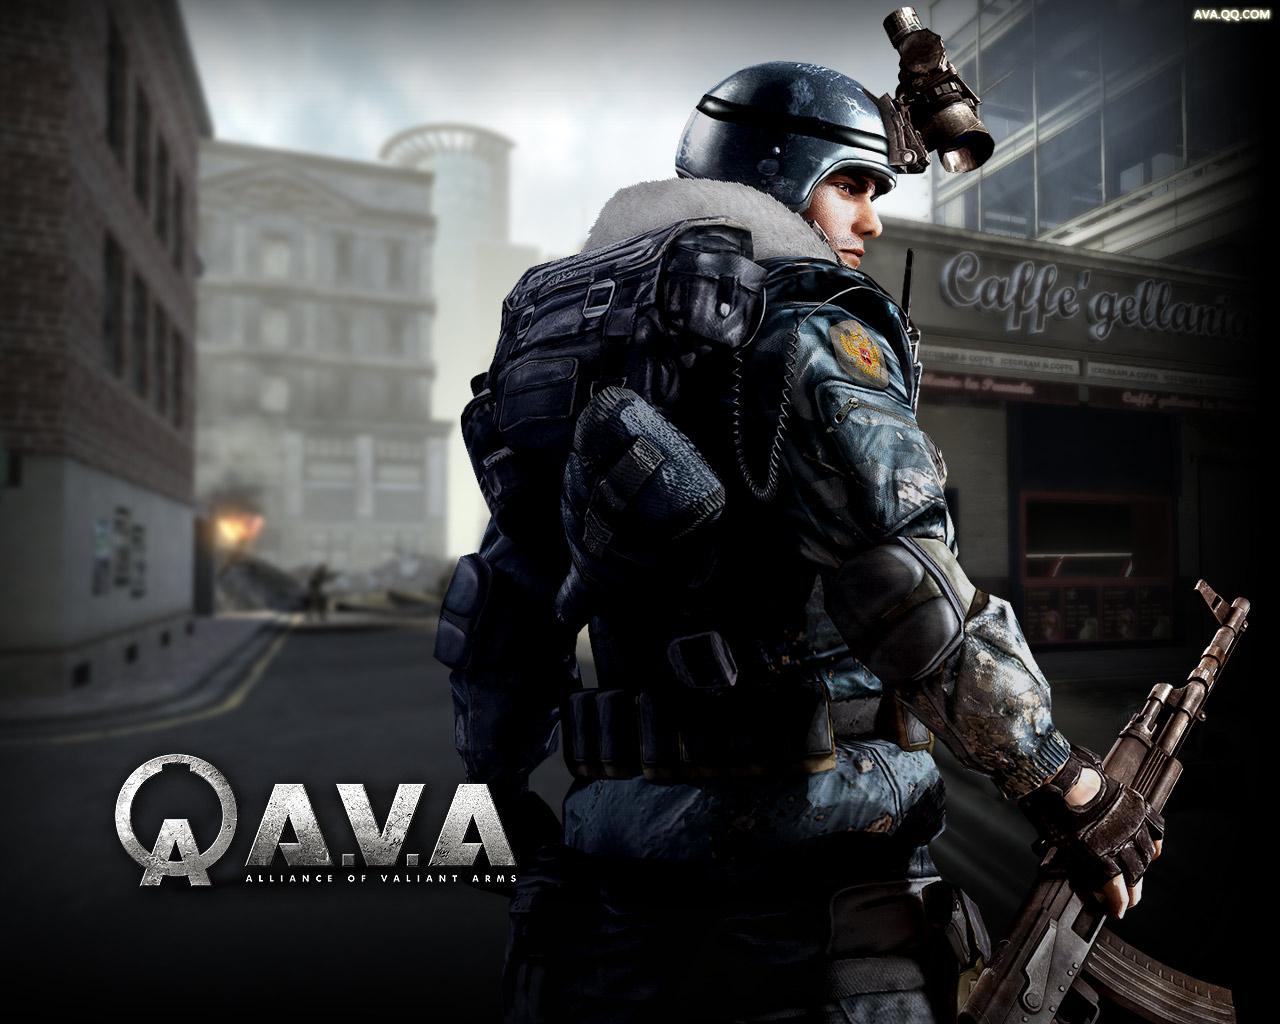 Alliance Of Valiant Arms 2021